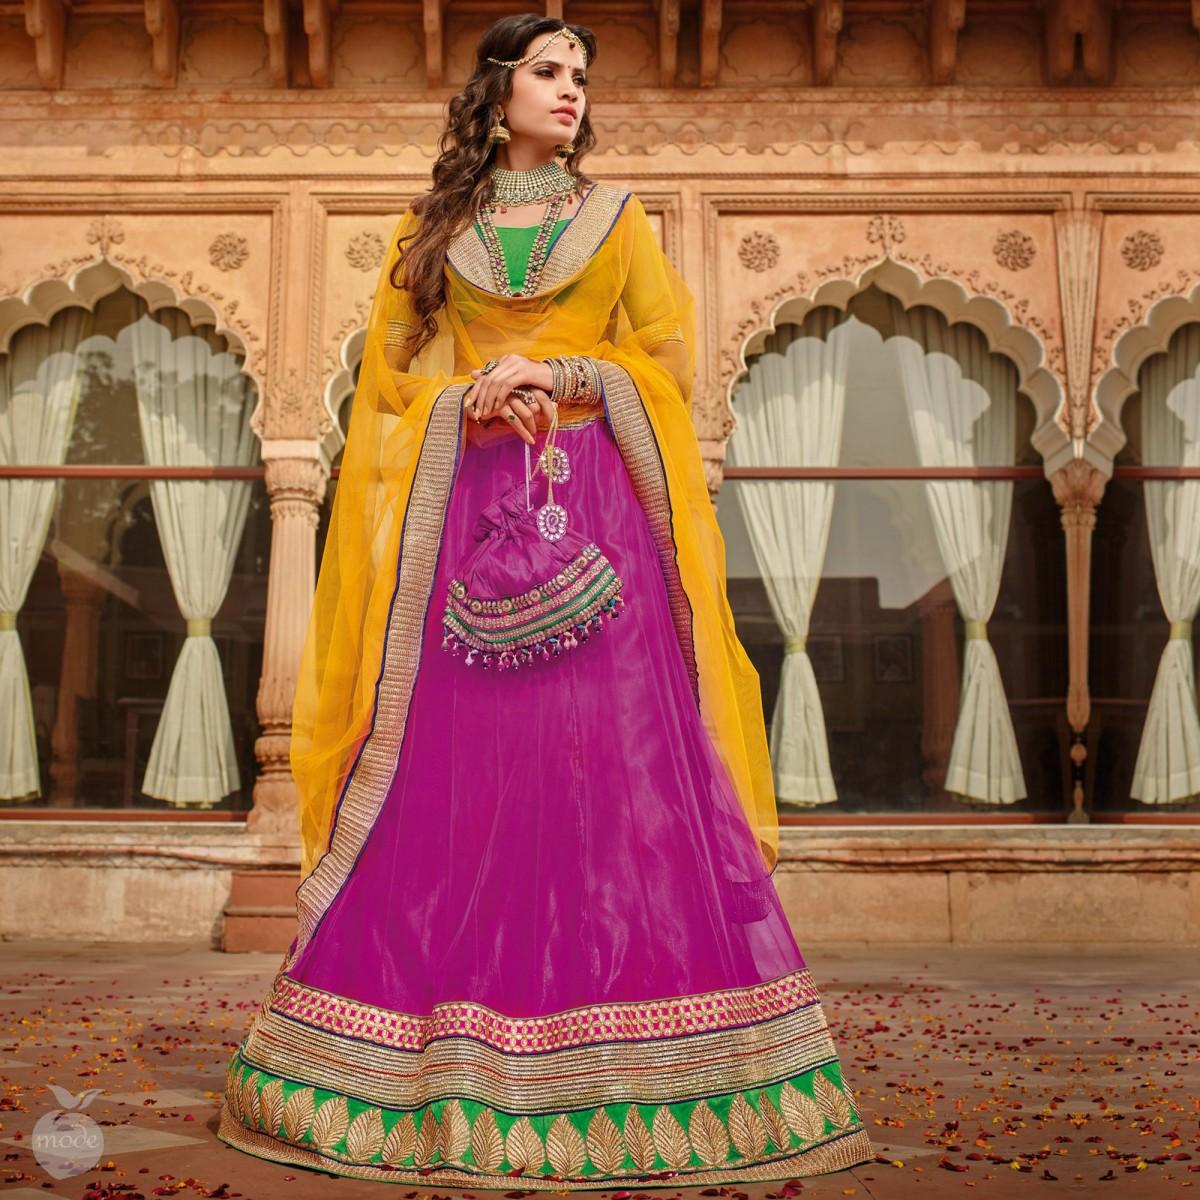 Mehndi Lehenga For Bride : Concepts of best lehenga outfits for mehndi wedding